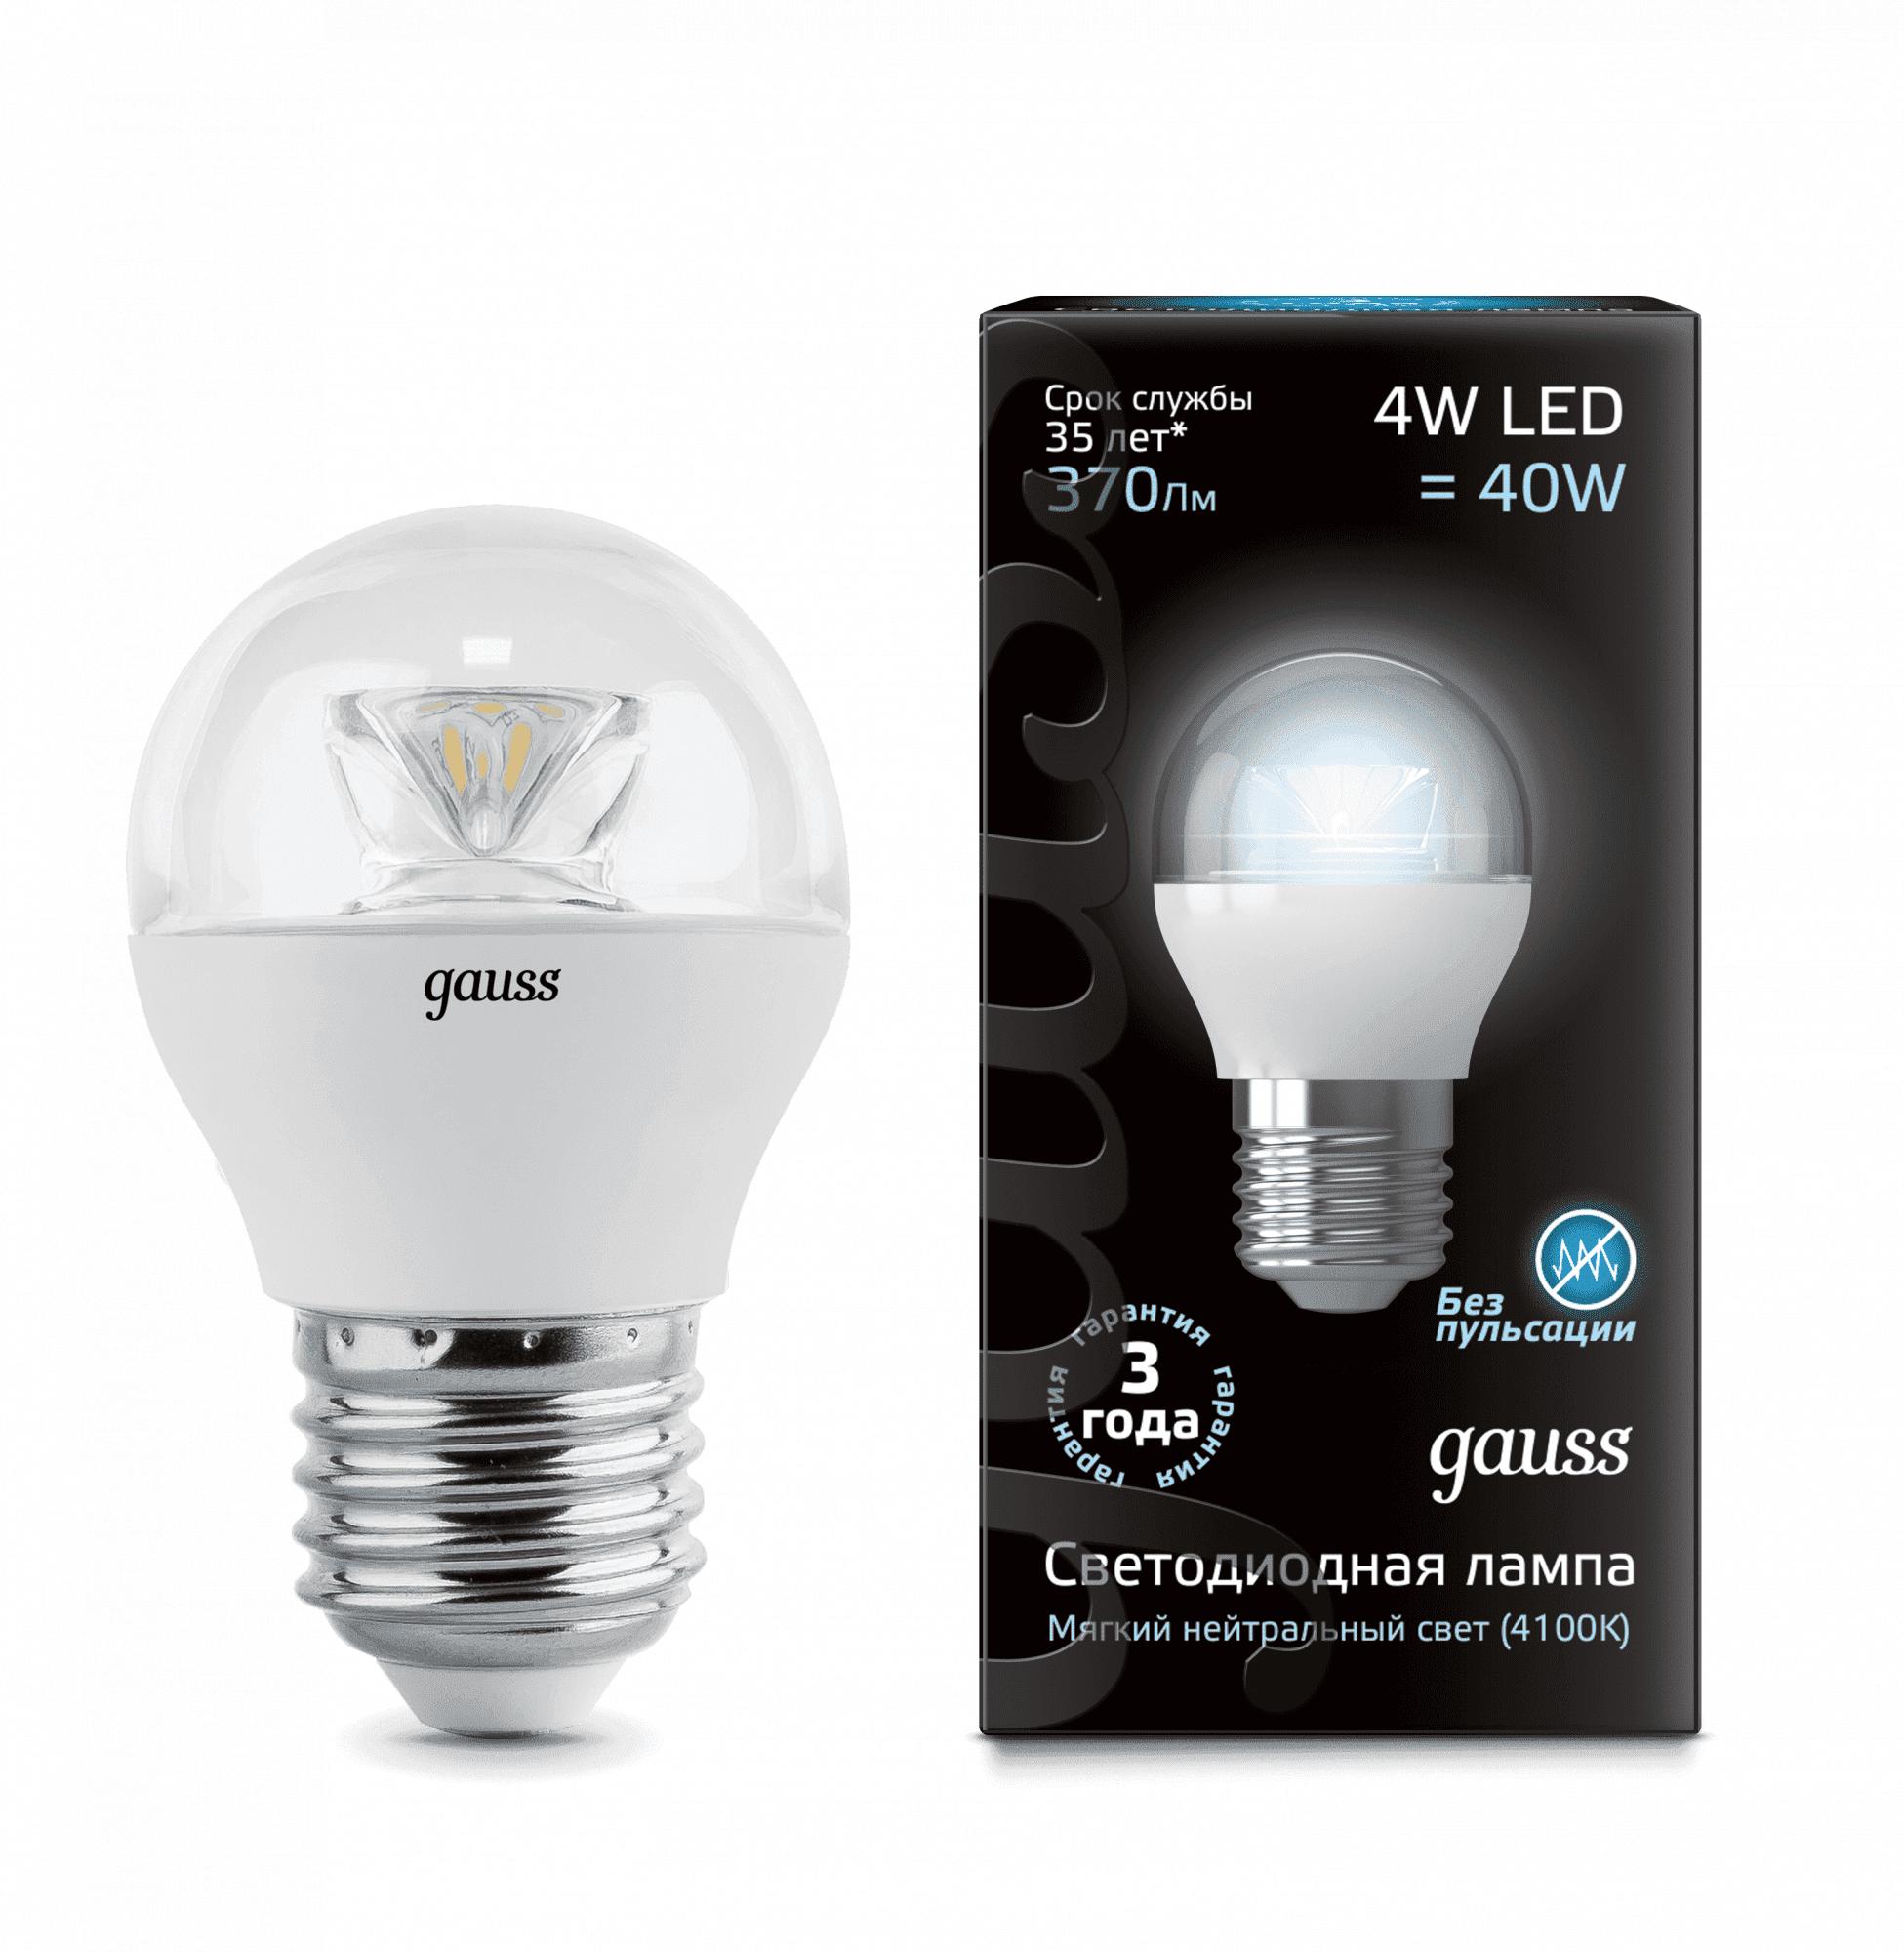 Gauss LED Globe Crystal Clear E27 4W 4100K 1/10/50 арт. 105202204